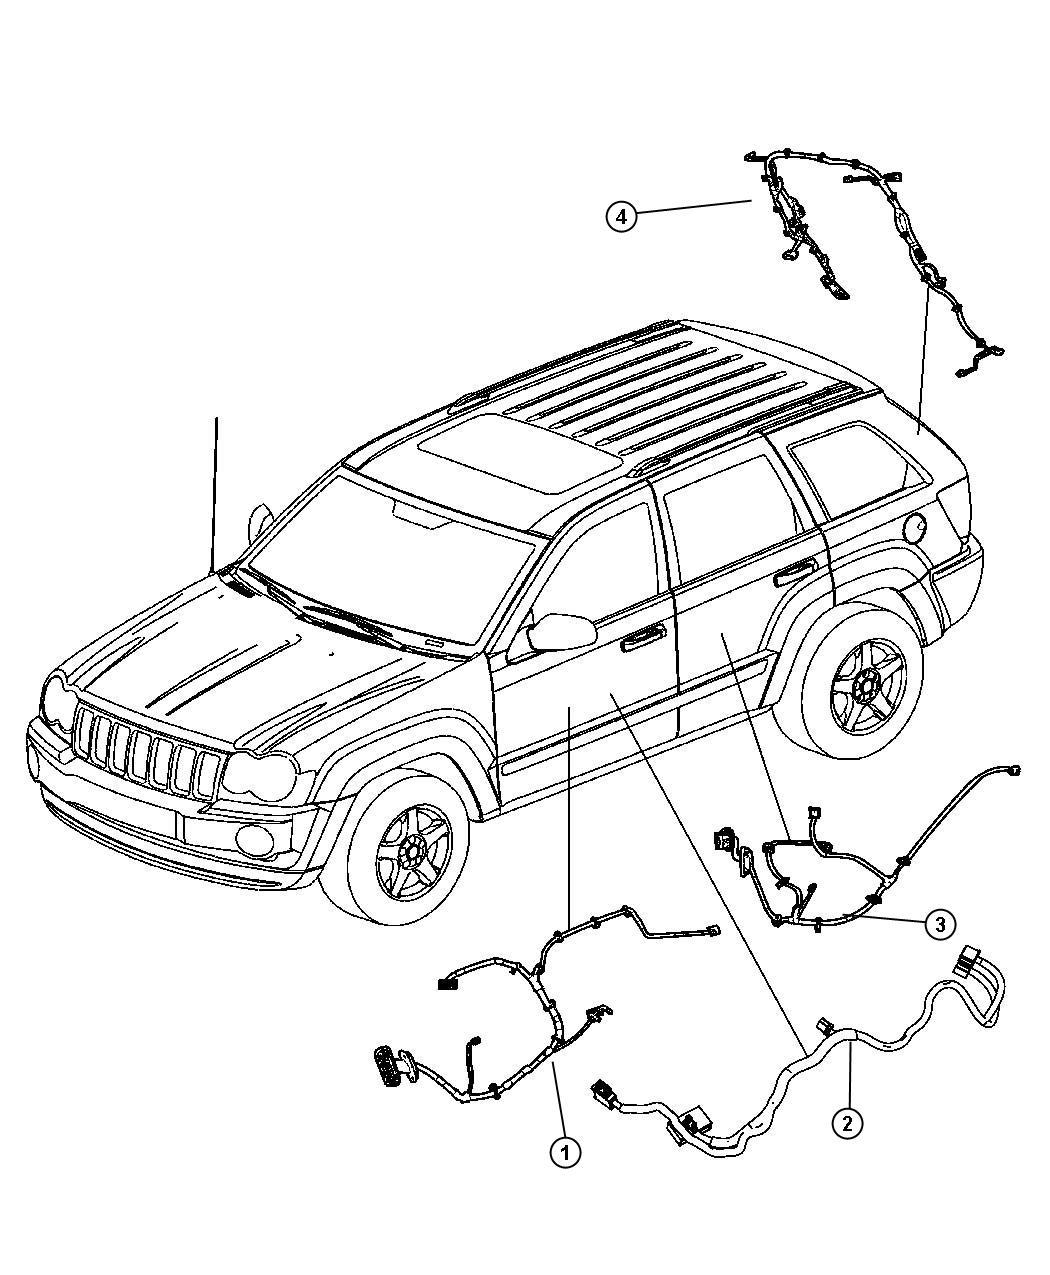 [DIAGRAM] Mopar Accessories For The 2011 Jeep Grand